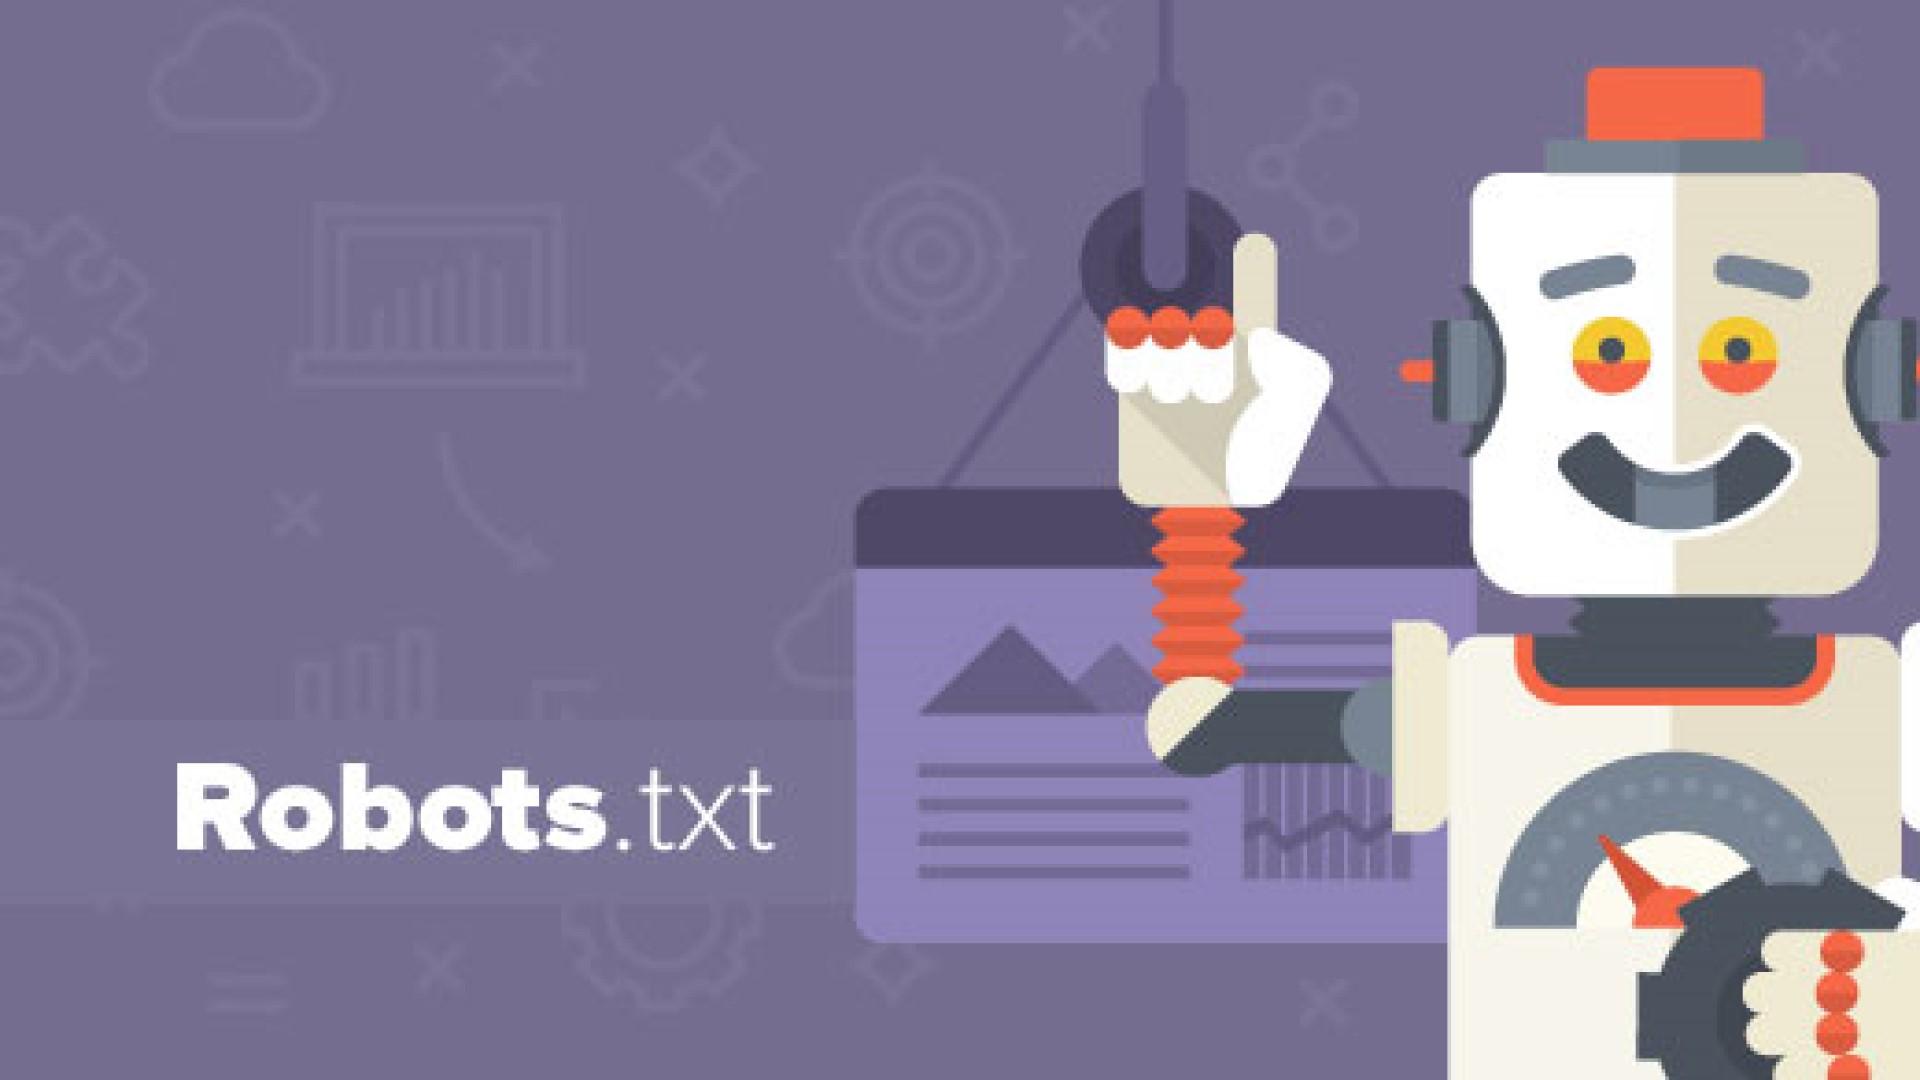 A good robots.txt can help avoid negative seo.